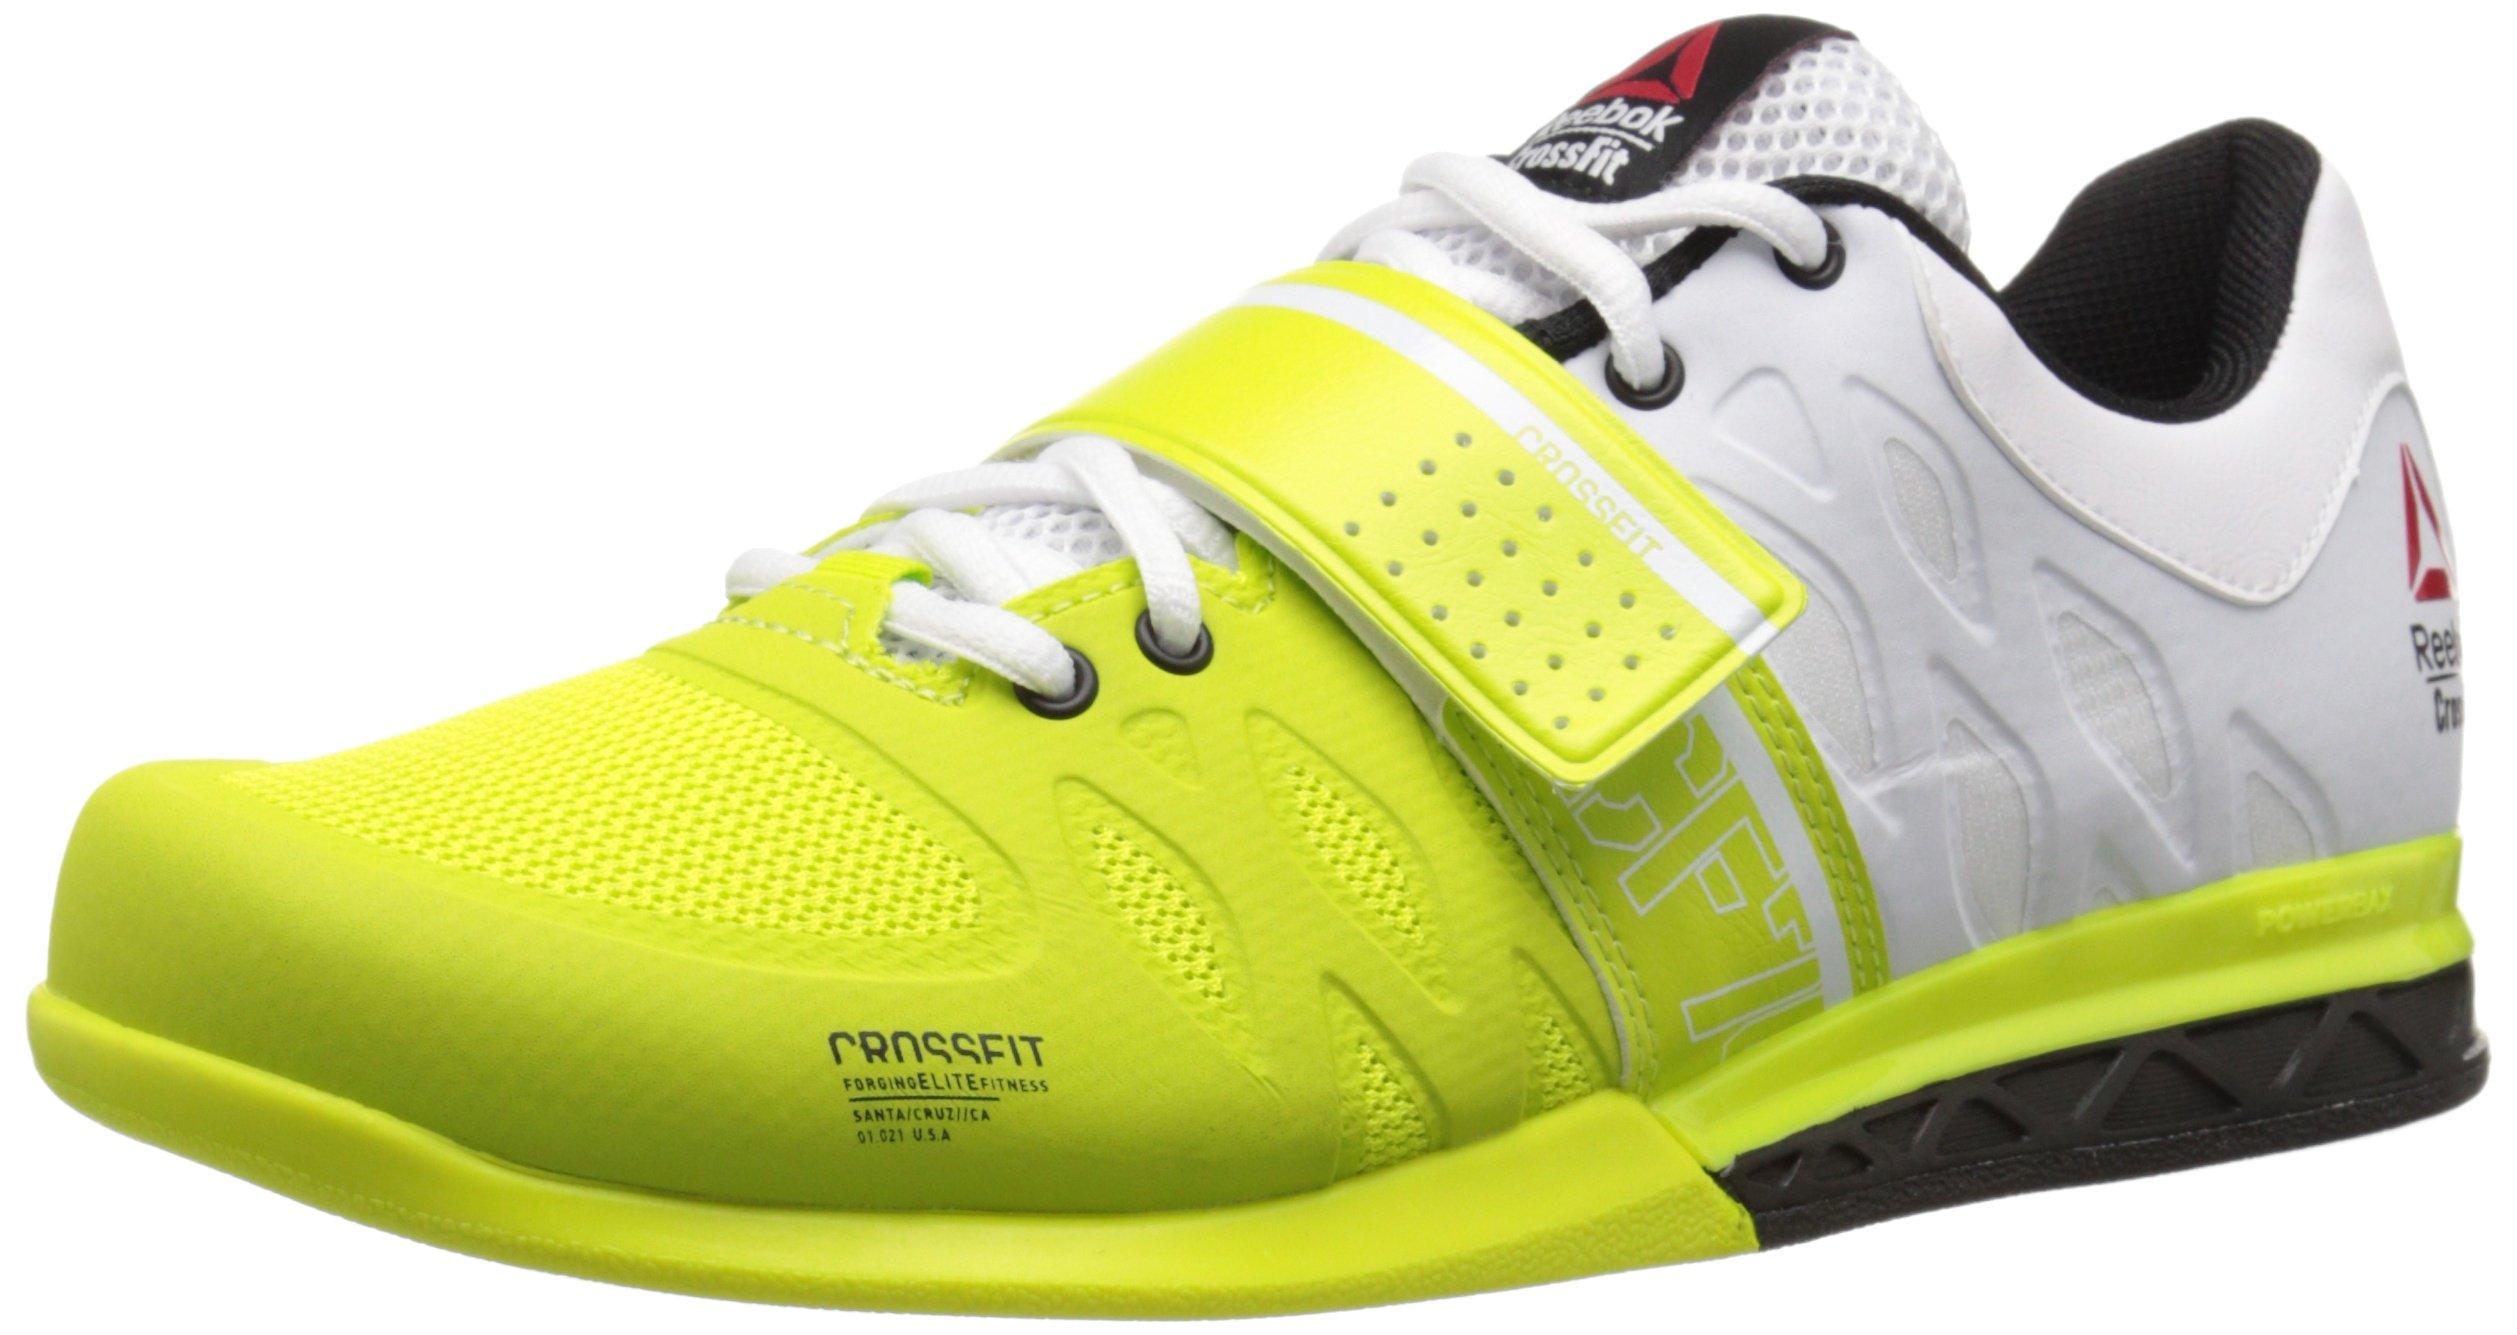 Reebok Men's R Crossfit Lifter 2.0 Training Shoe, Semi Solar Yellow/White/Black, 7.5 M US by Reebok